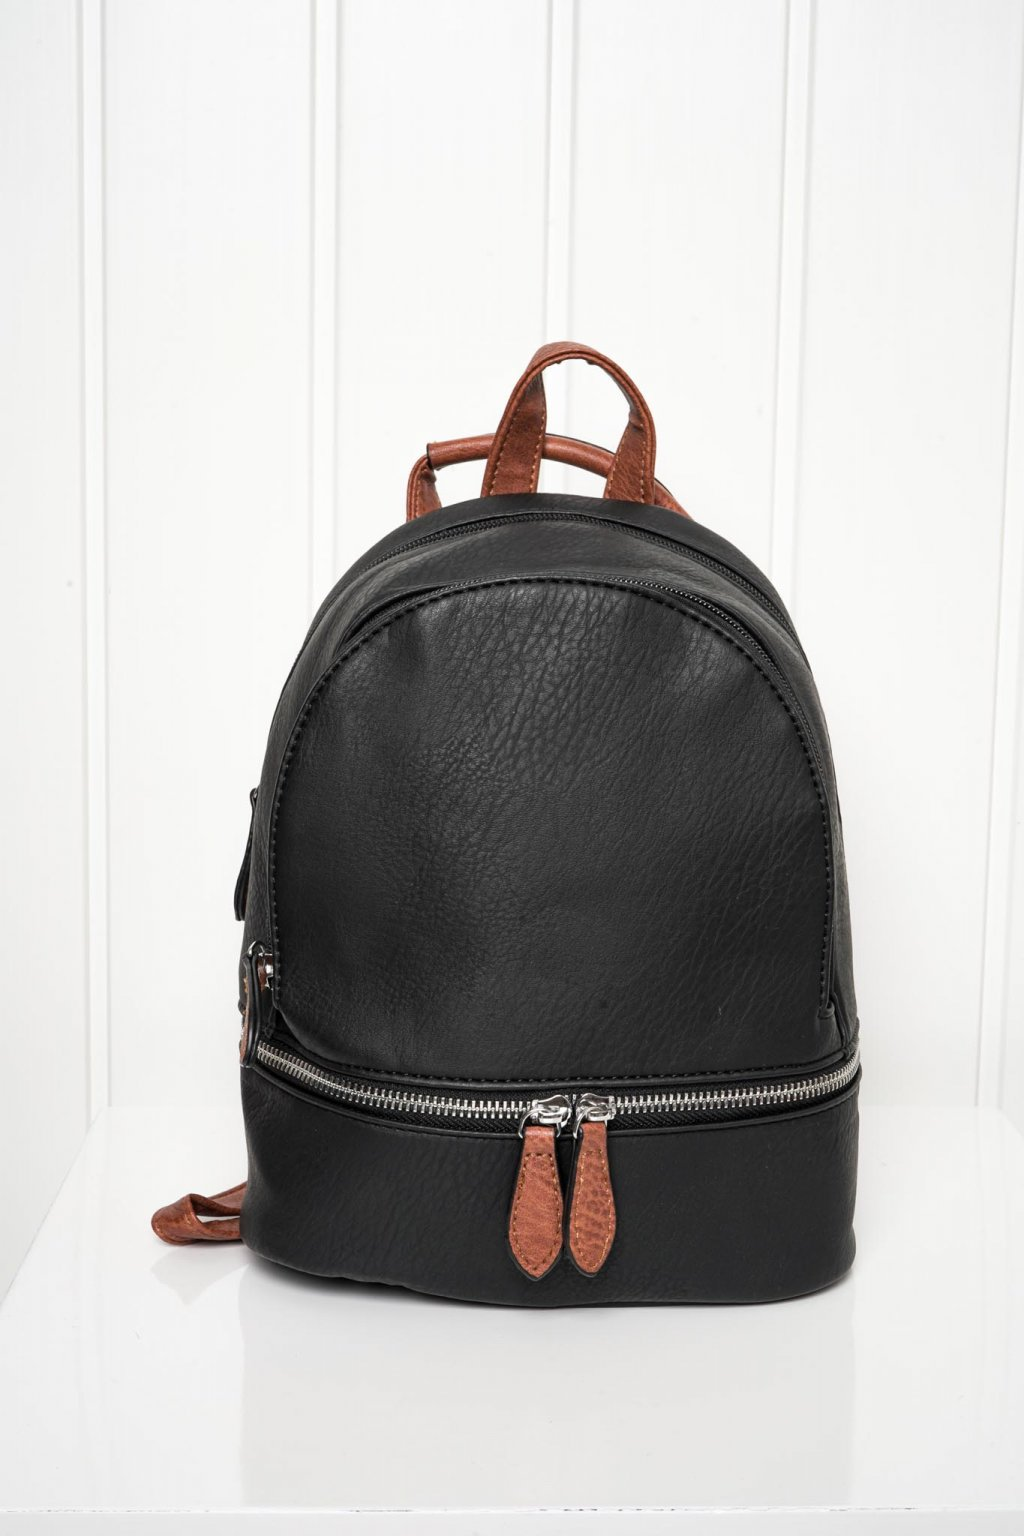 Kabelka, crossbody, ruksak, shopping bag, shopperka, 163